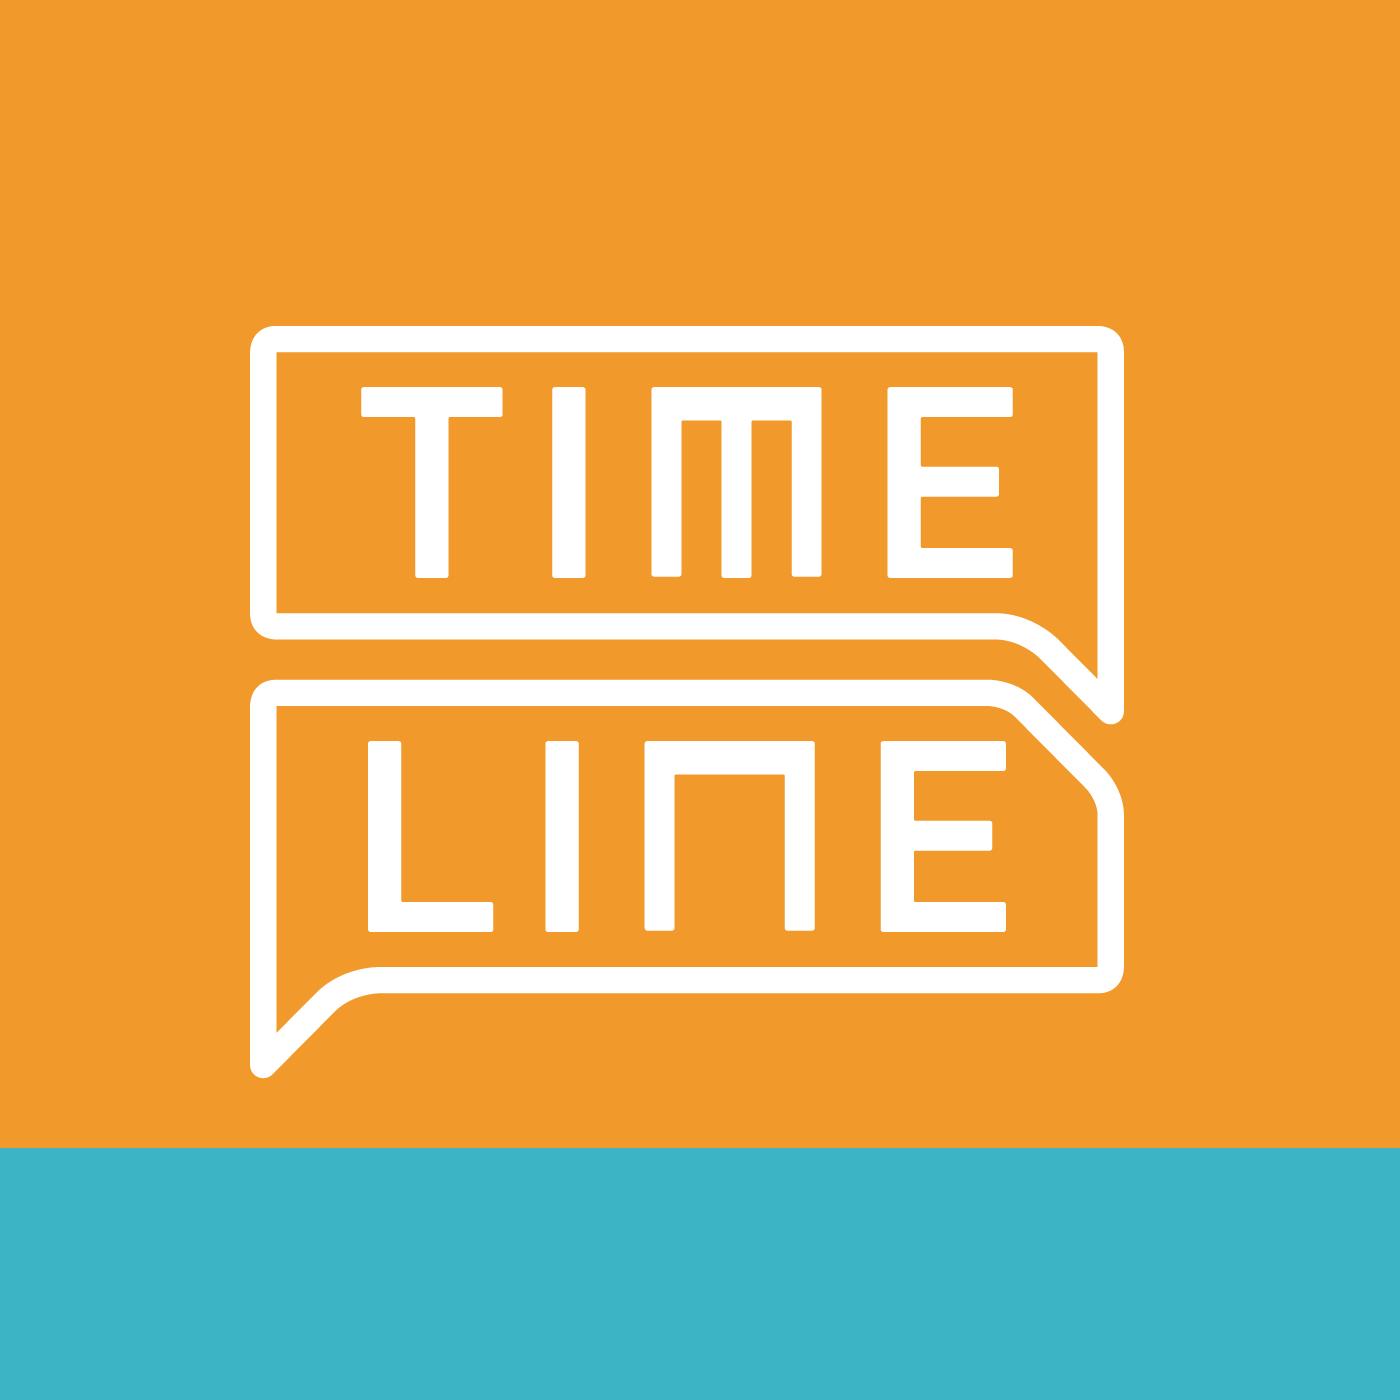 Timeline Gaúcha 23.02.2018